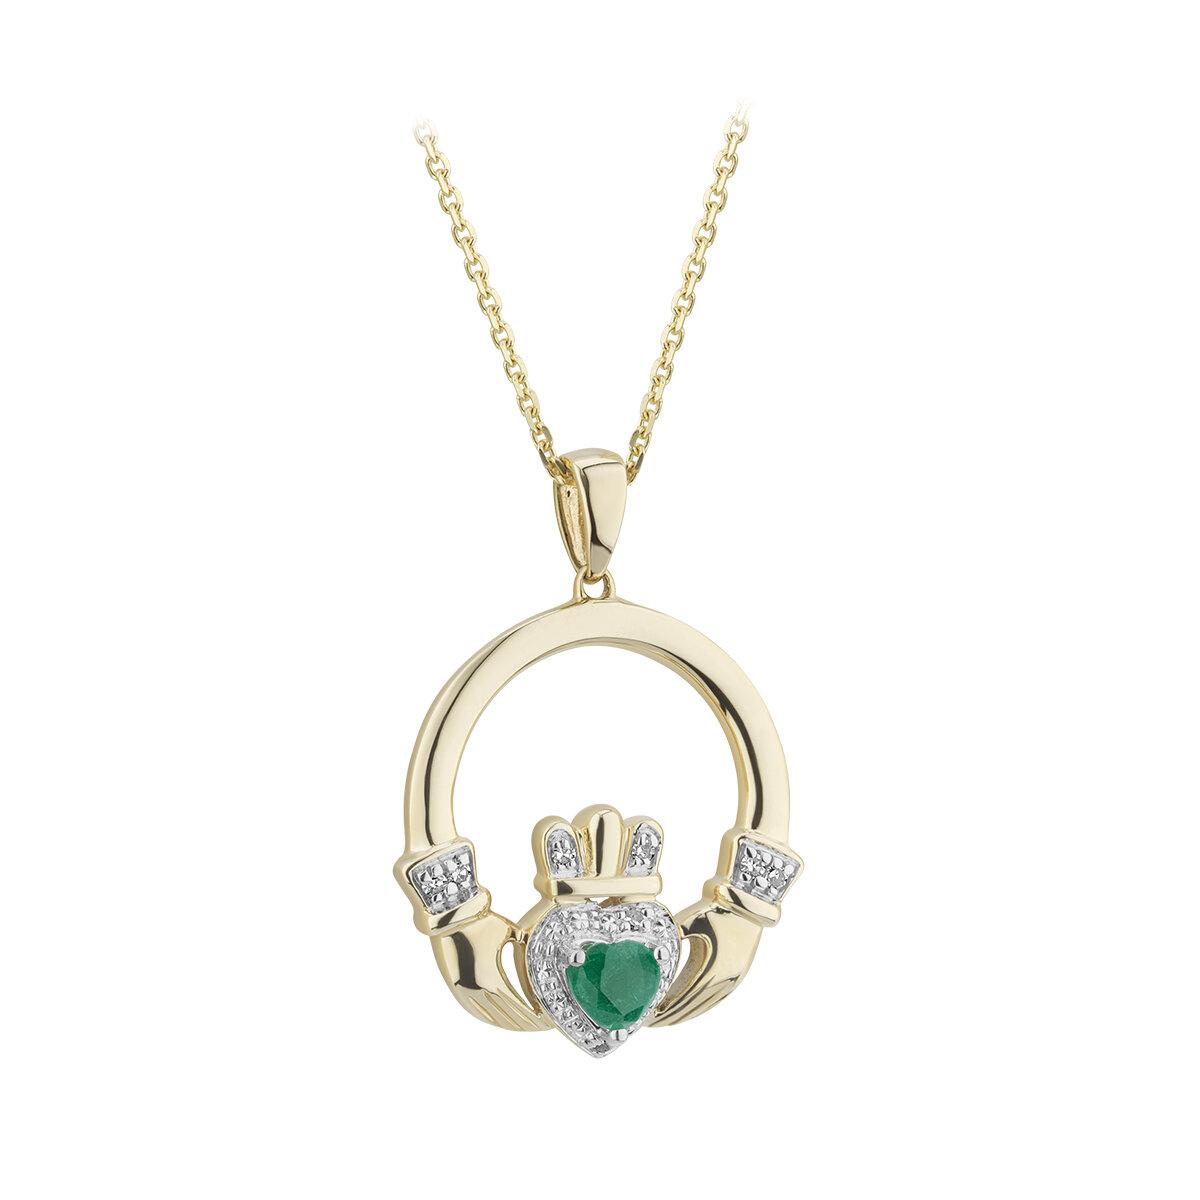 14k gold emerald and diamond claddagh pendant s46531 from Solvar